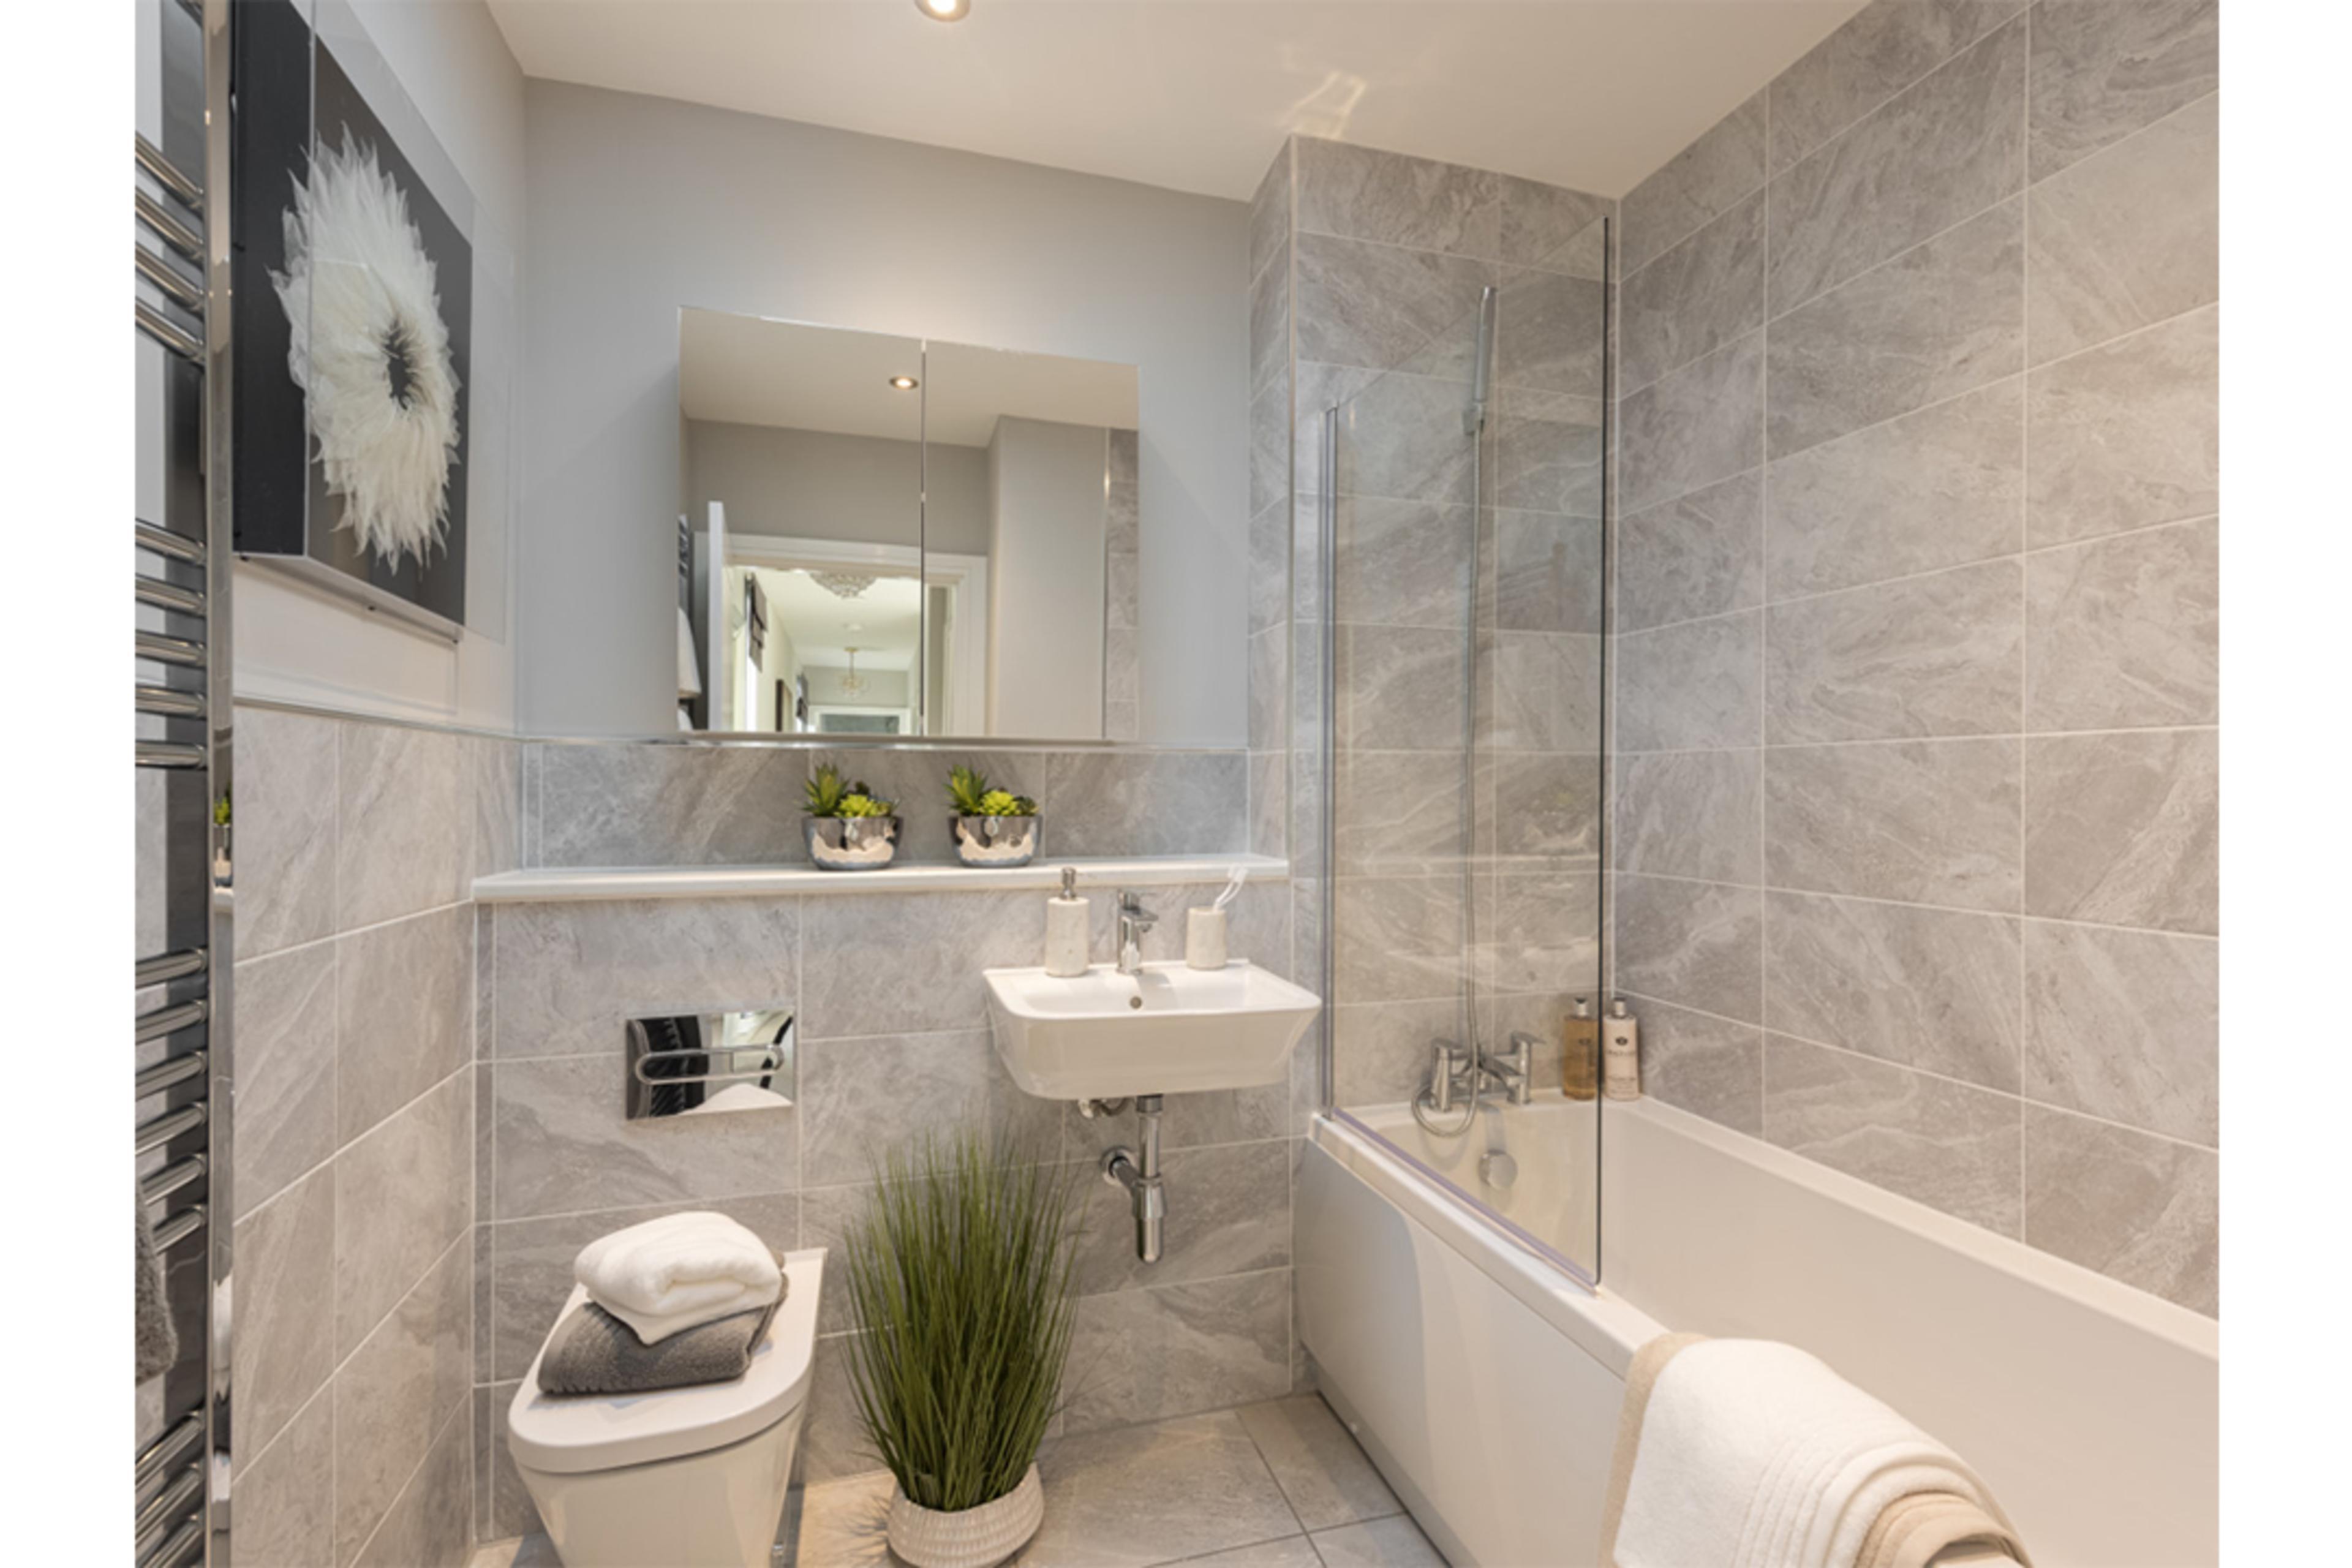 new-build-home-harrogate-watling-grange-bathroom-1